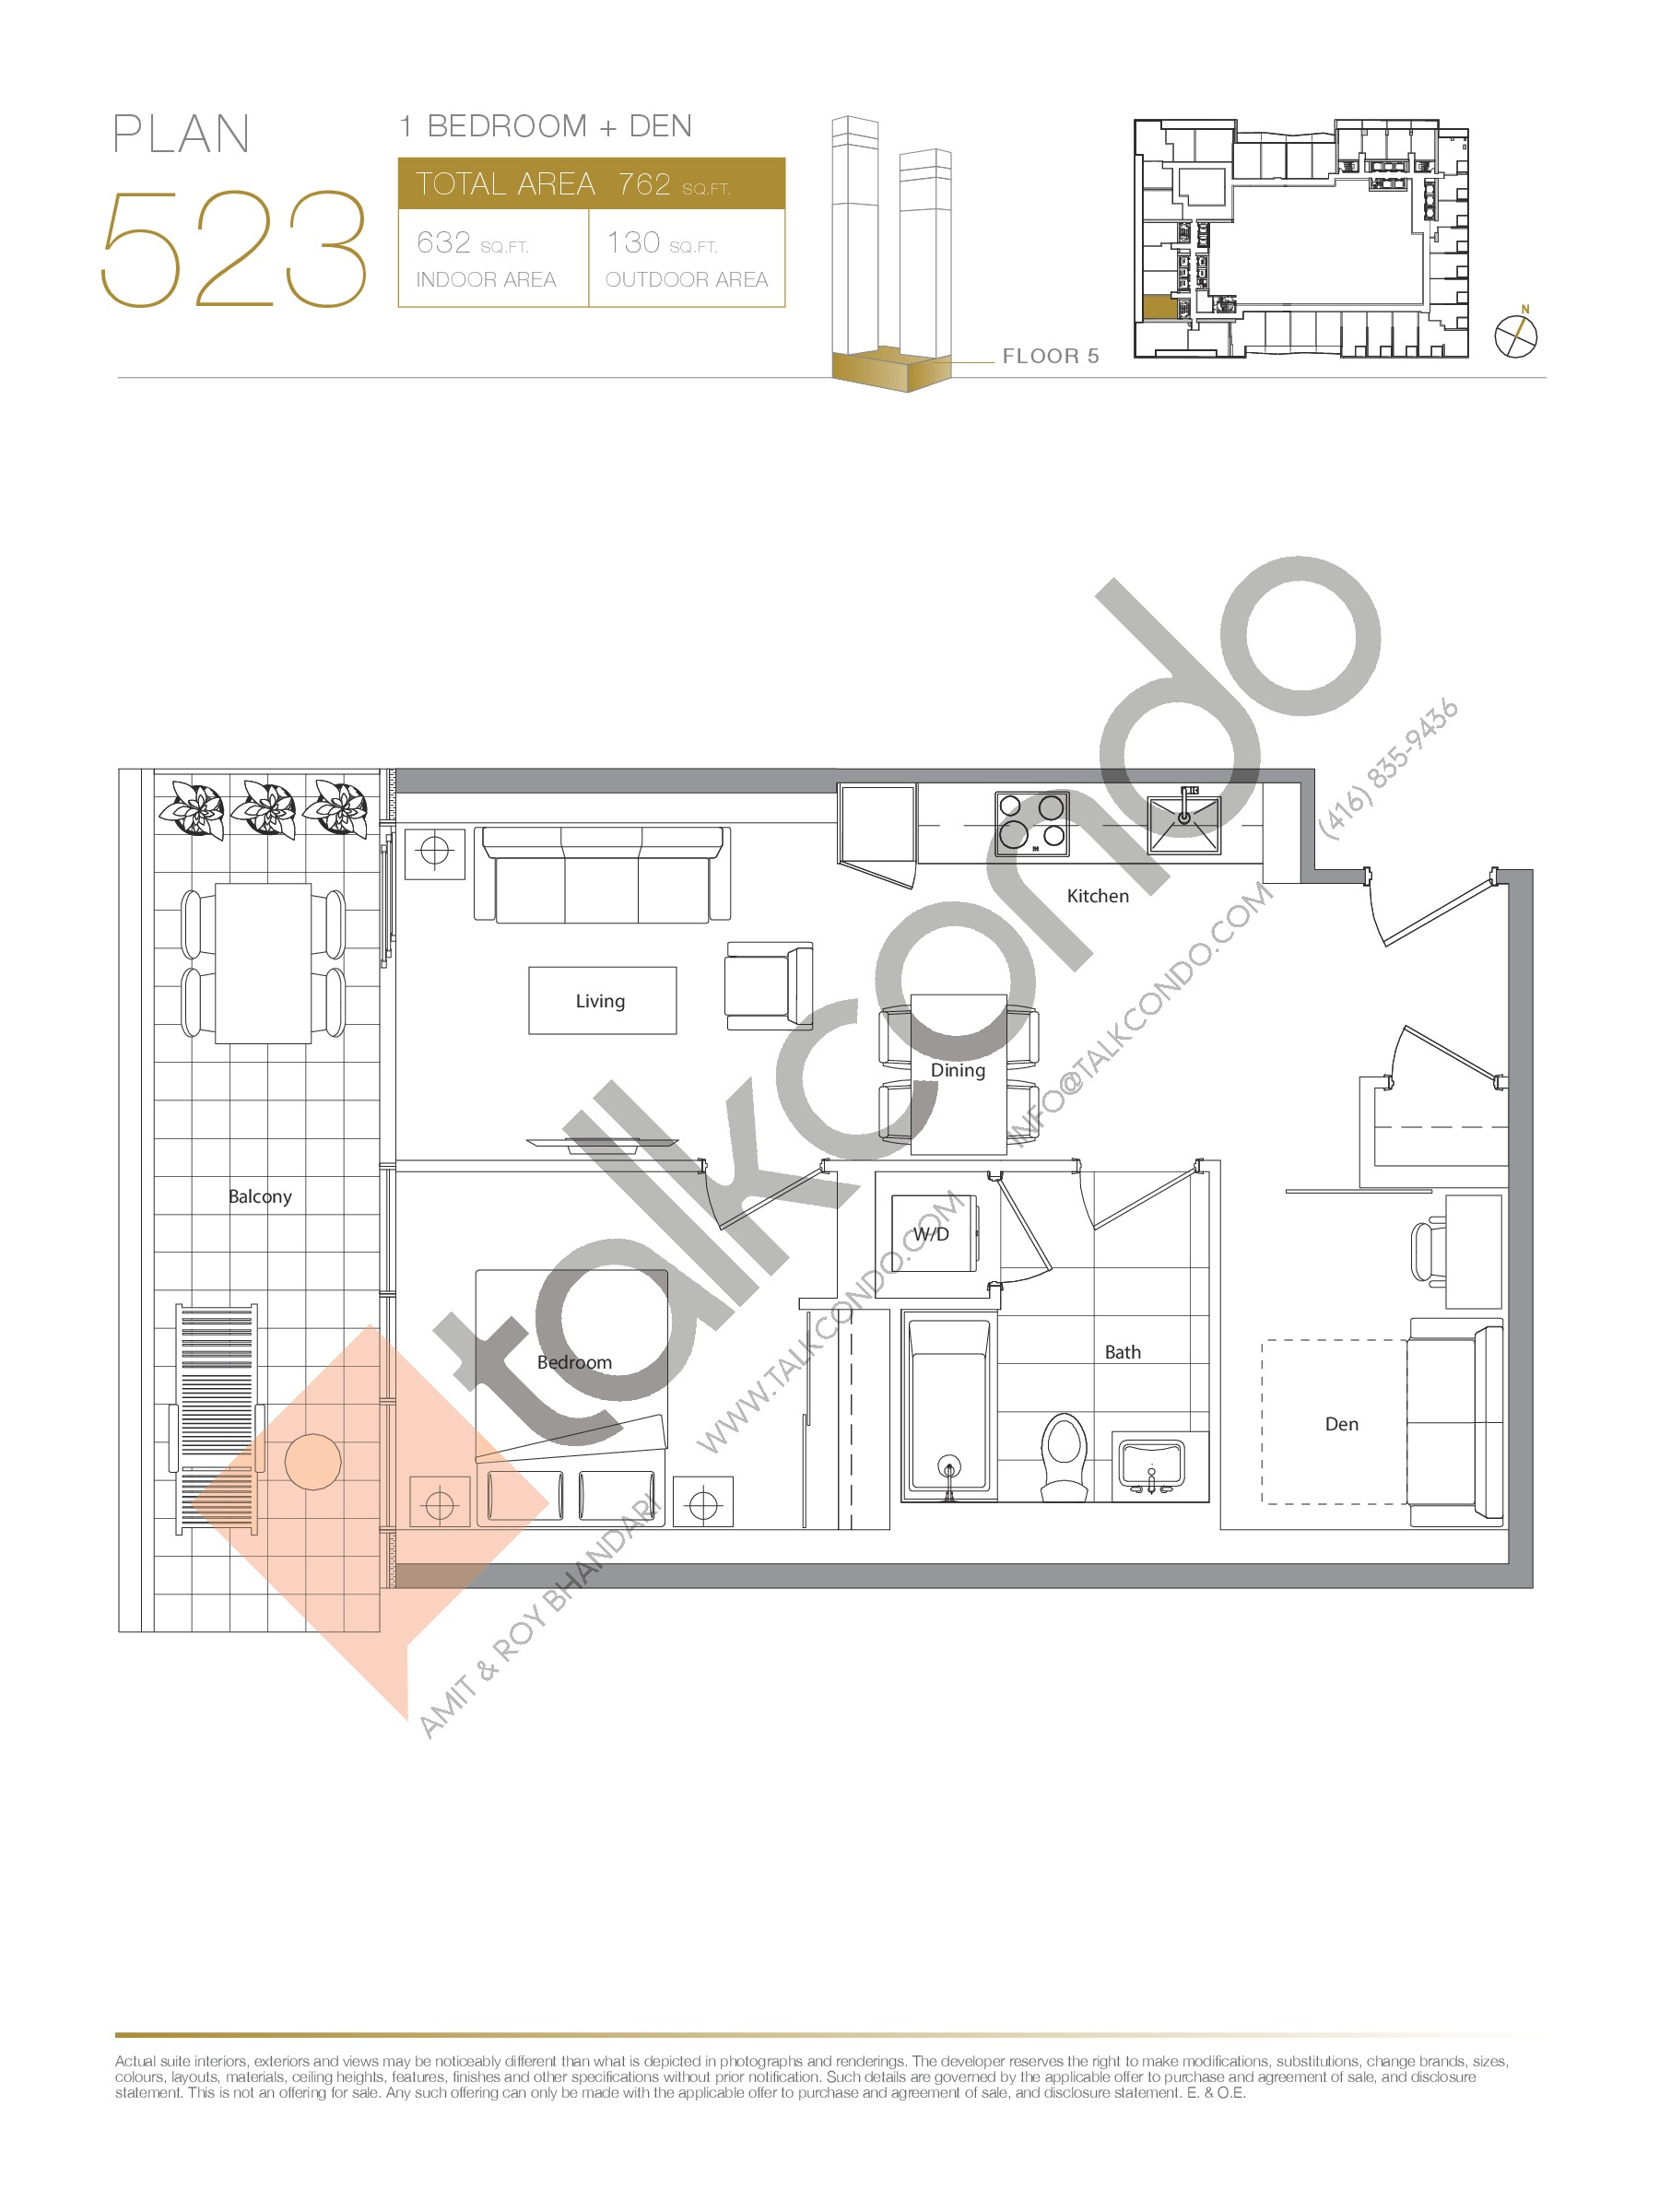 Plan 523 Floor Plan at Concord Canada House Condos - 632 sq.ft